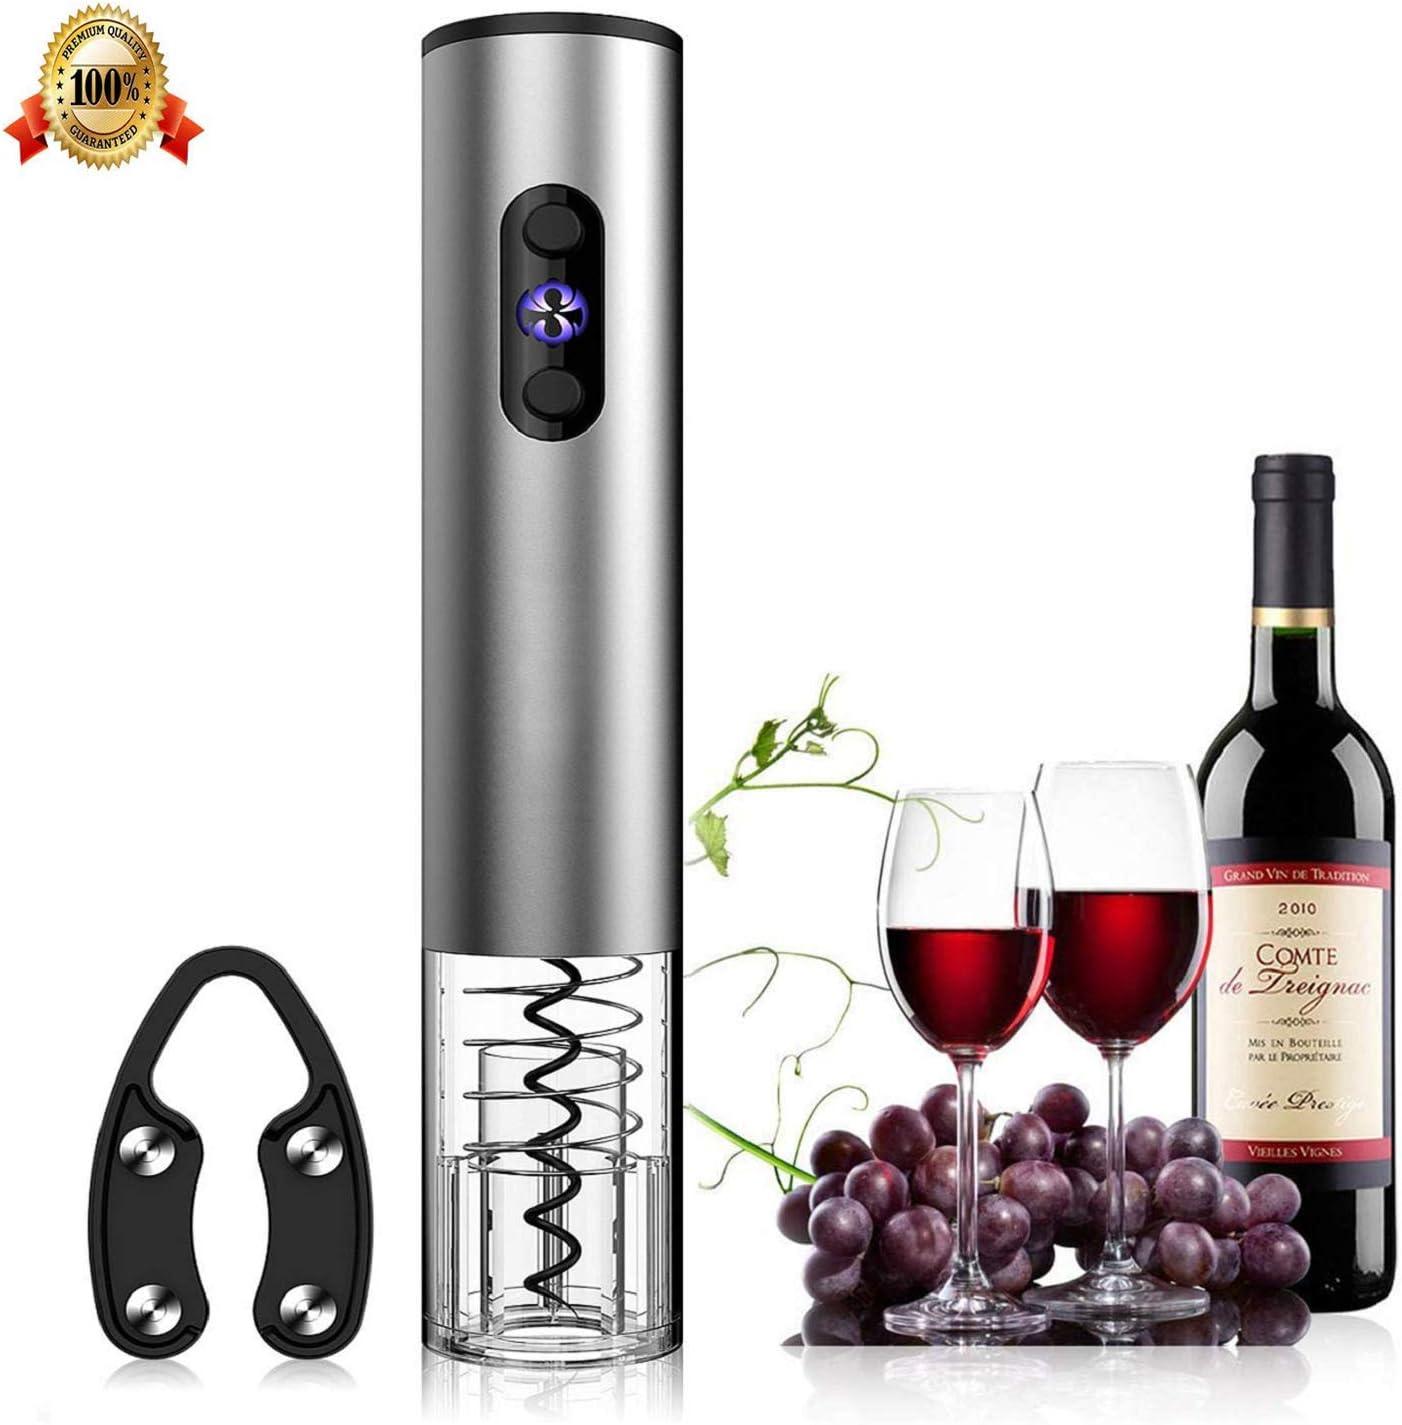 Electric Wine Bottle Opener Auto Cordless Corkscrew Red Wine Cork Remover Opener